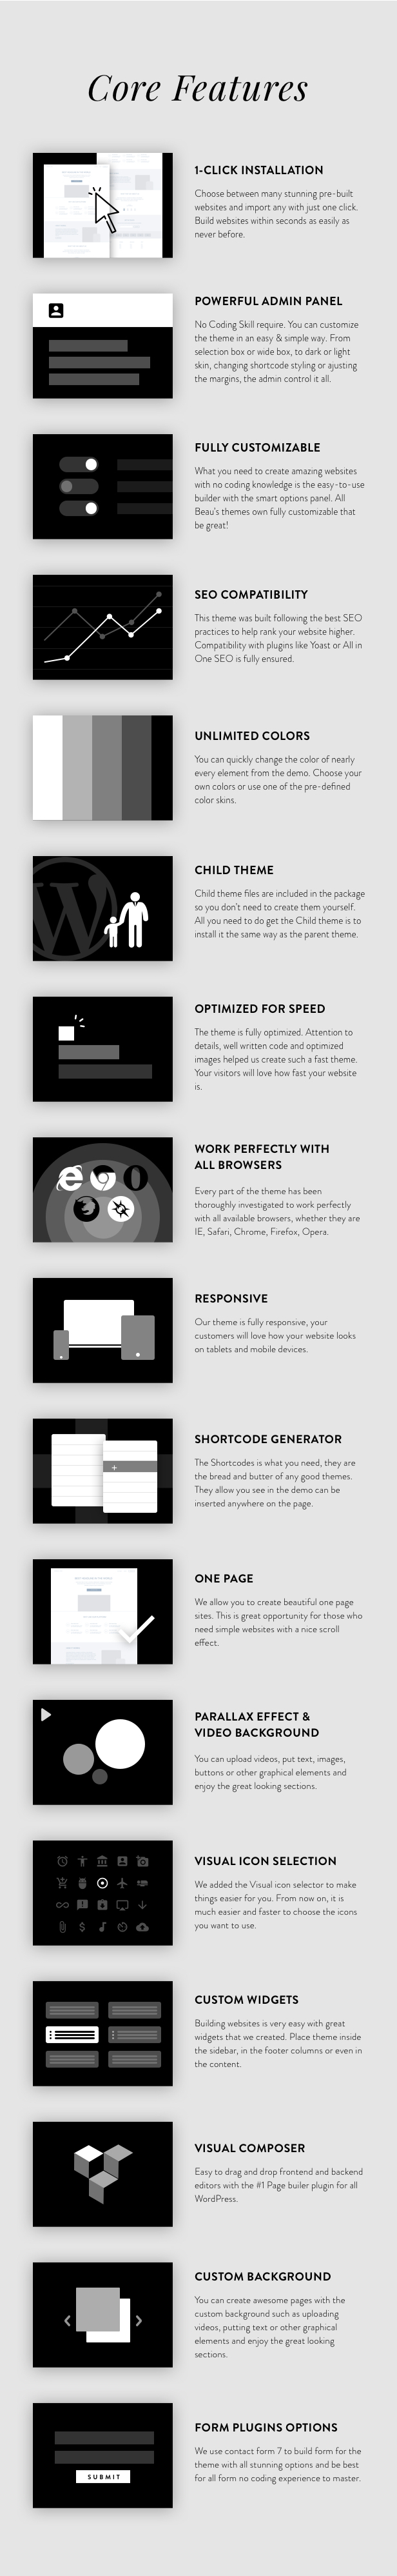 FilmMaker WordPress Theme: Film Studio - Movie Production - Video Blogger - Creative Agency - 4